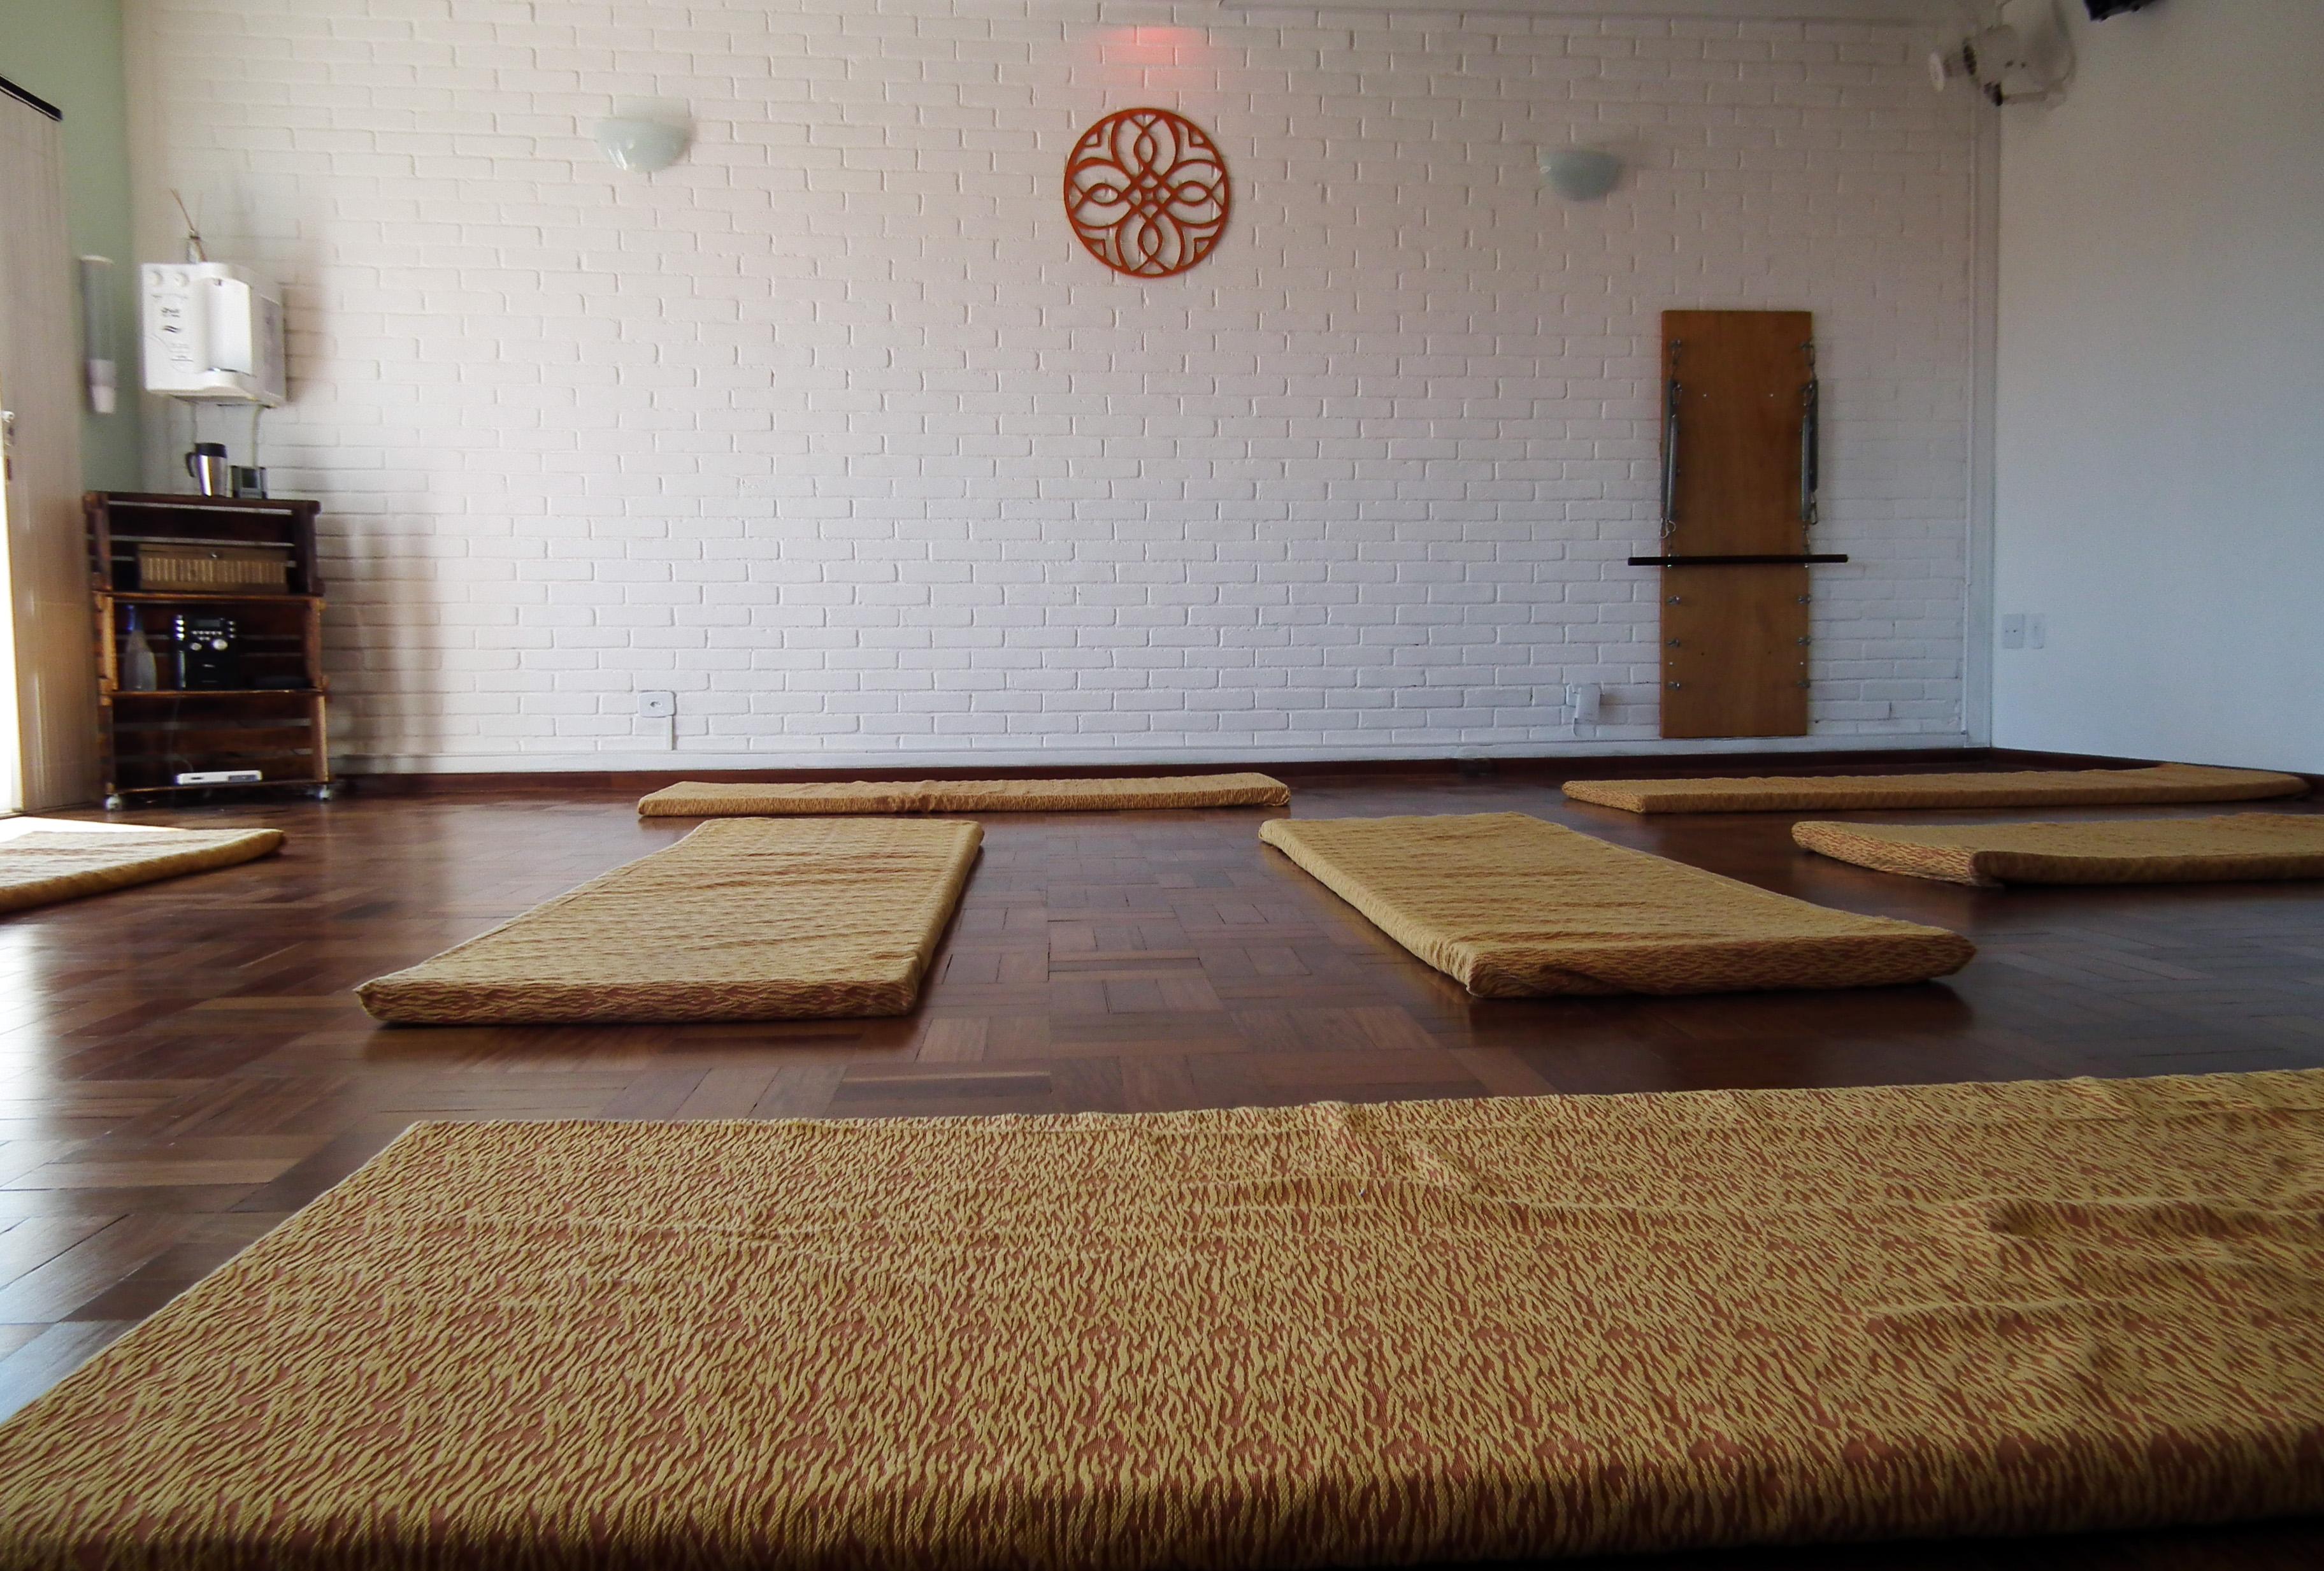 Yoga03.jpg